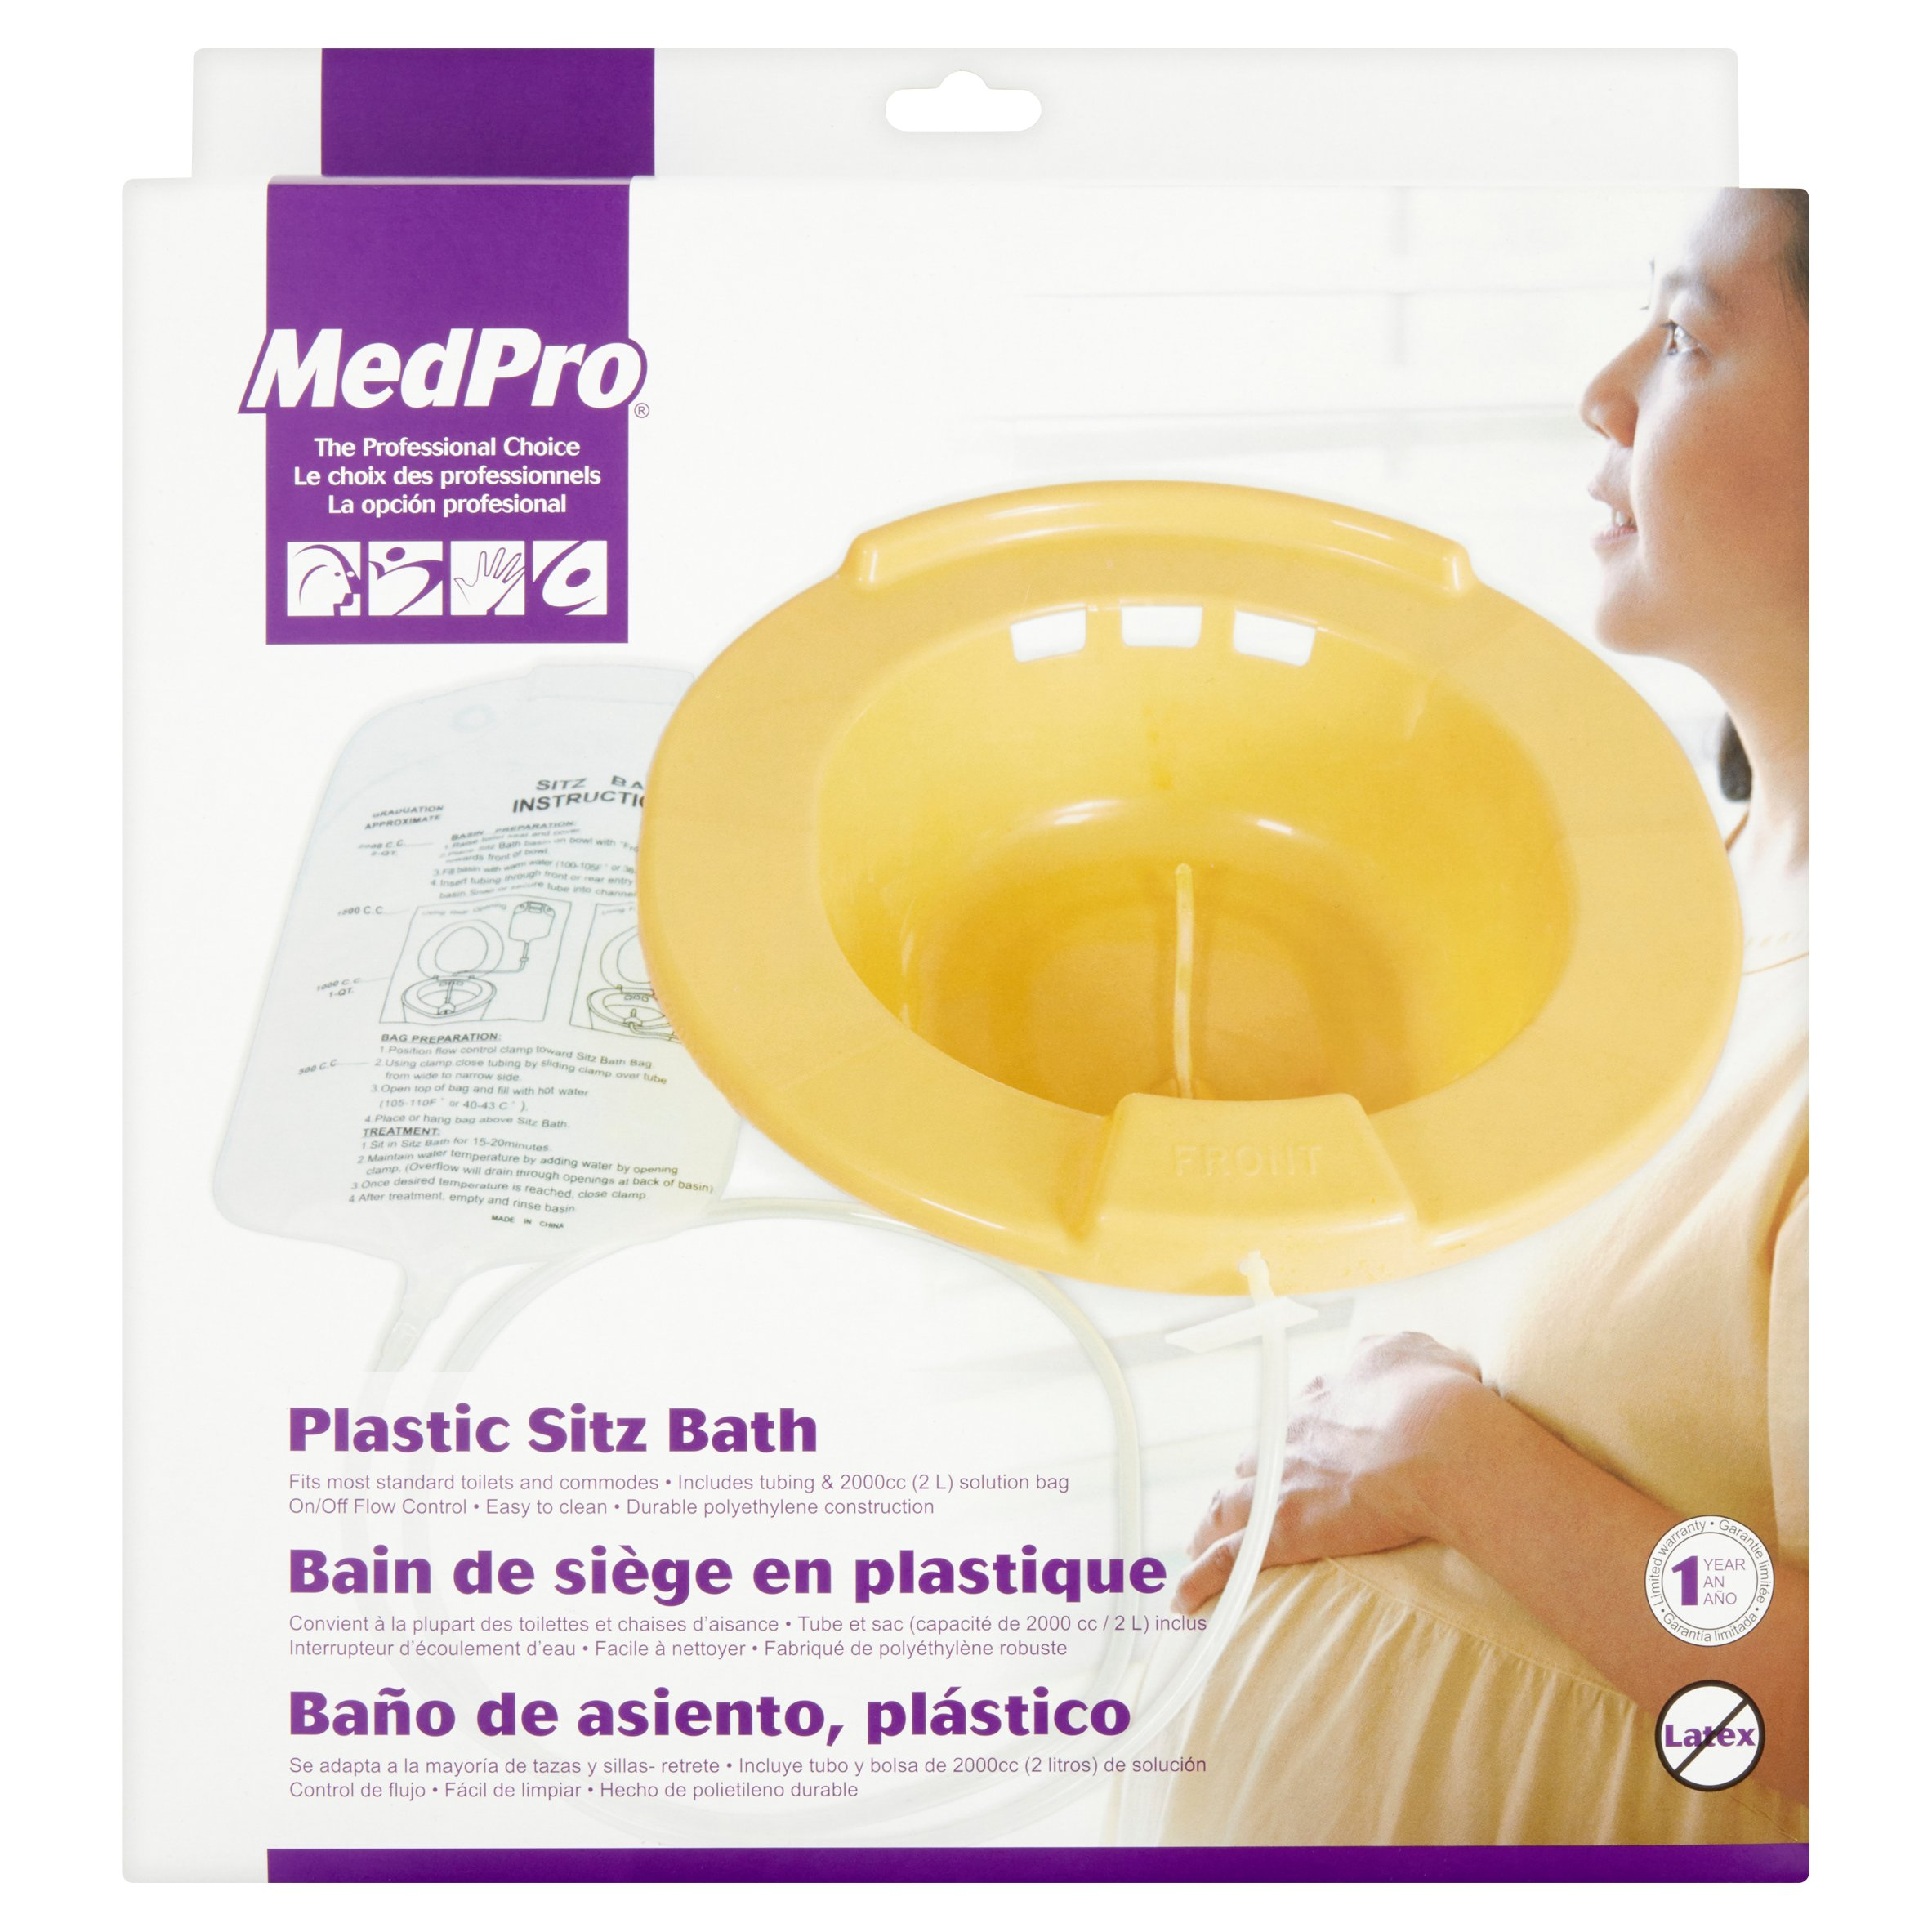 medpro plastic sitz bath - walmart, Skeleton